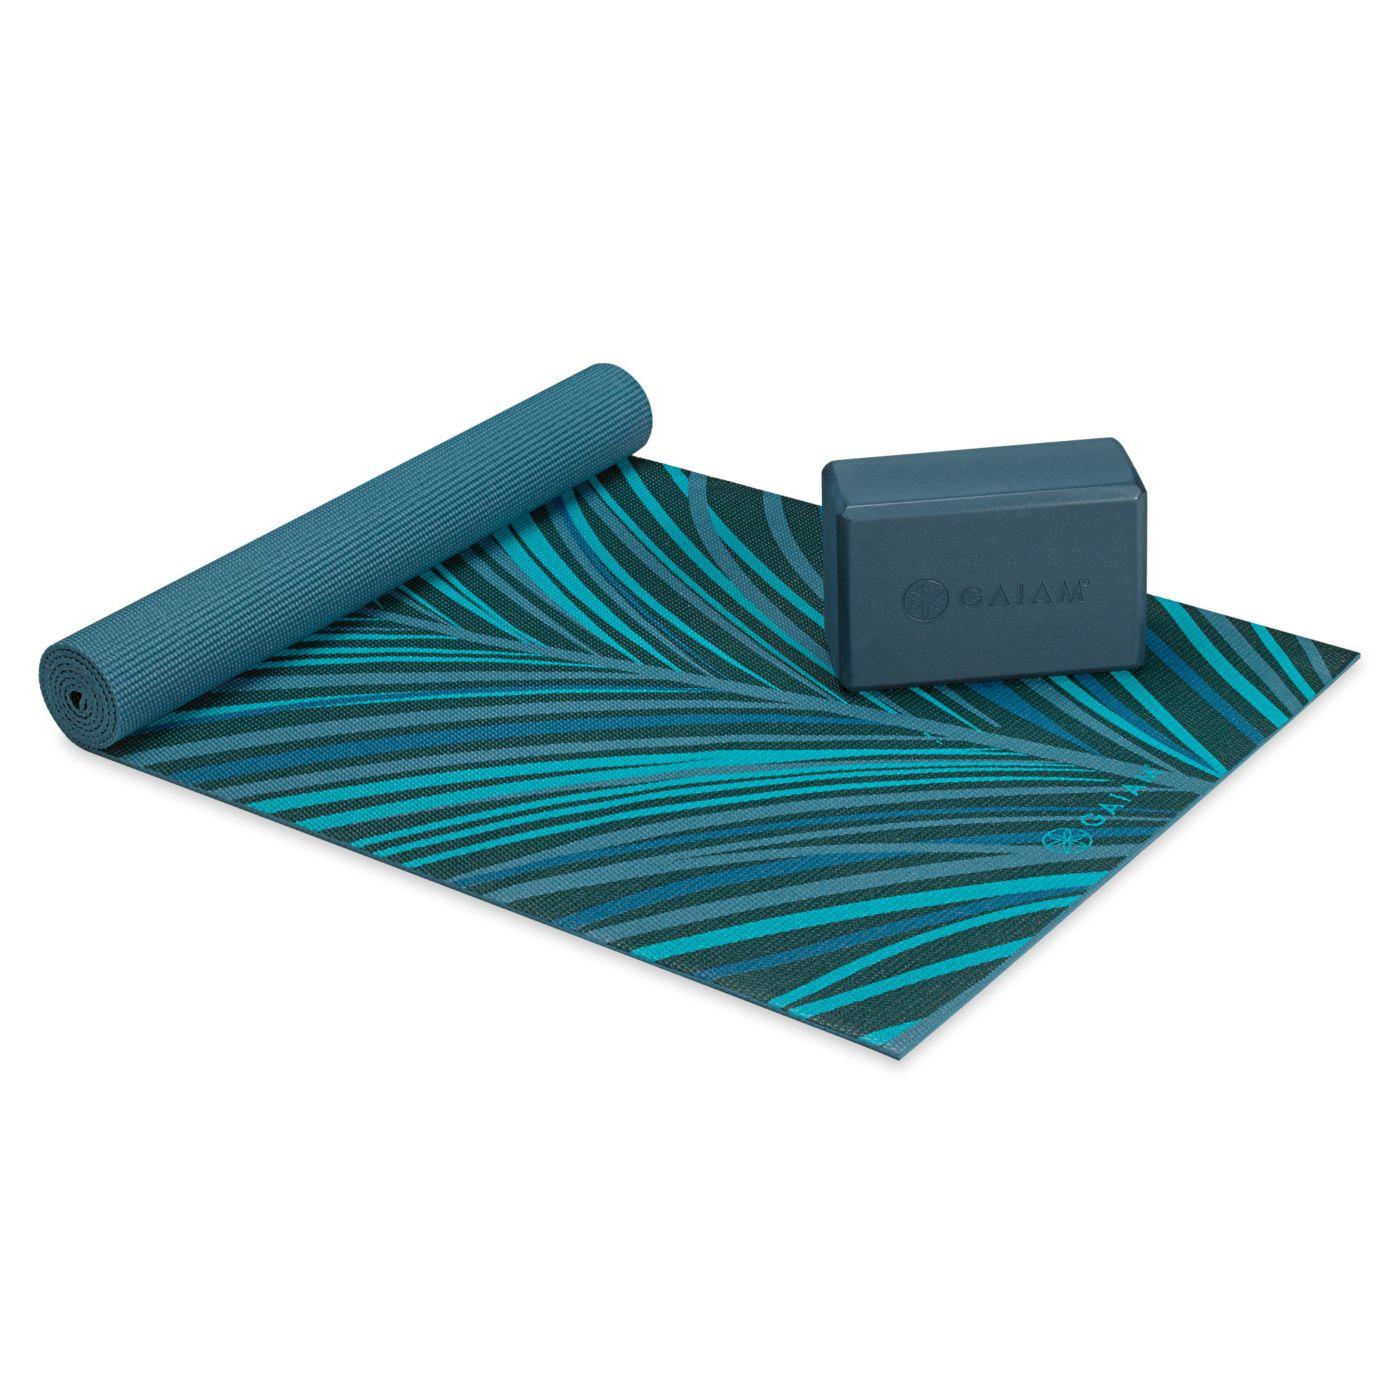 Gaiam Cushion Support Kit